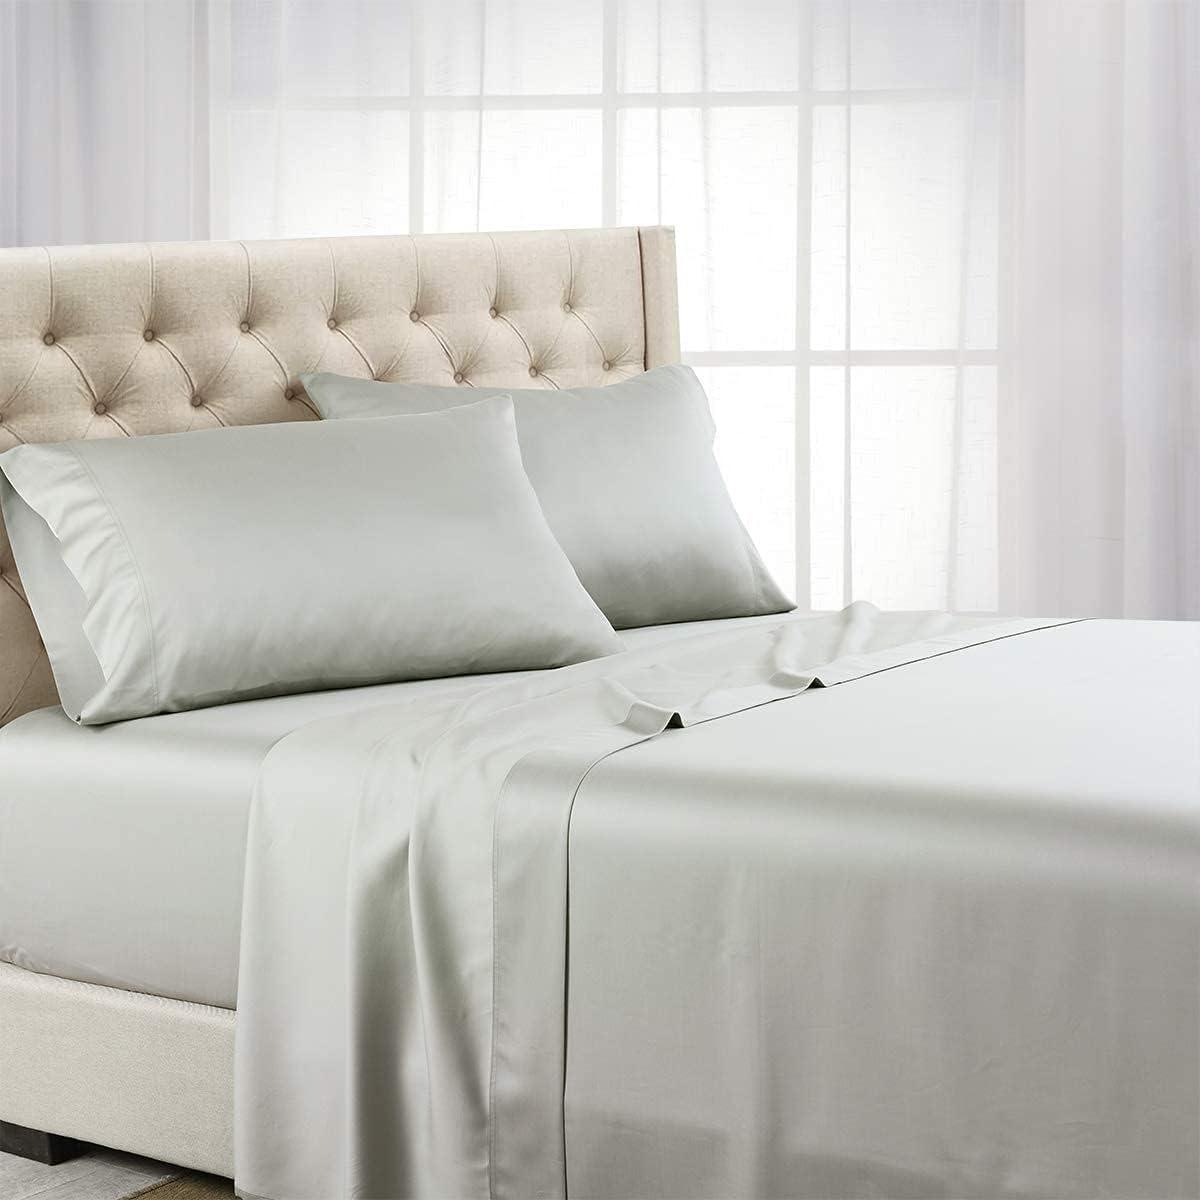 Royal Hotel Bedding ABRIPEDIC Tencel Sheets, Silky Soft and Naturally Pure Fabric, 100% Woven Tencel Lyocell Sheet Set, 4PC Set, Full Size, Gray